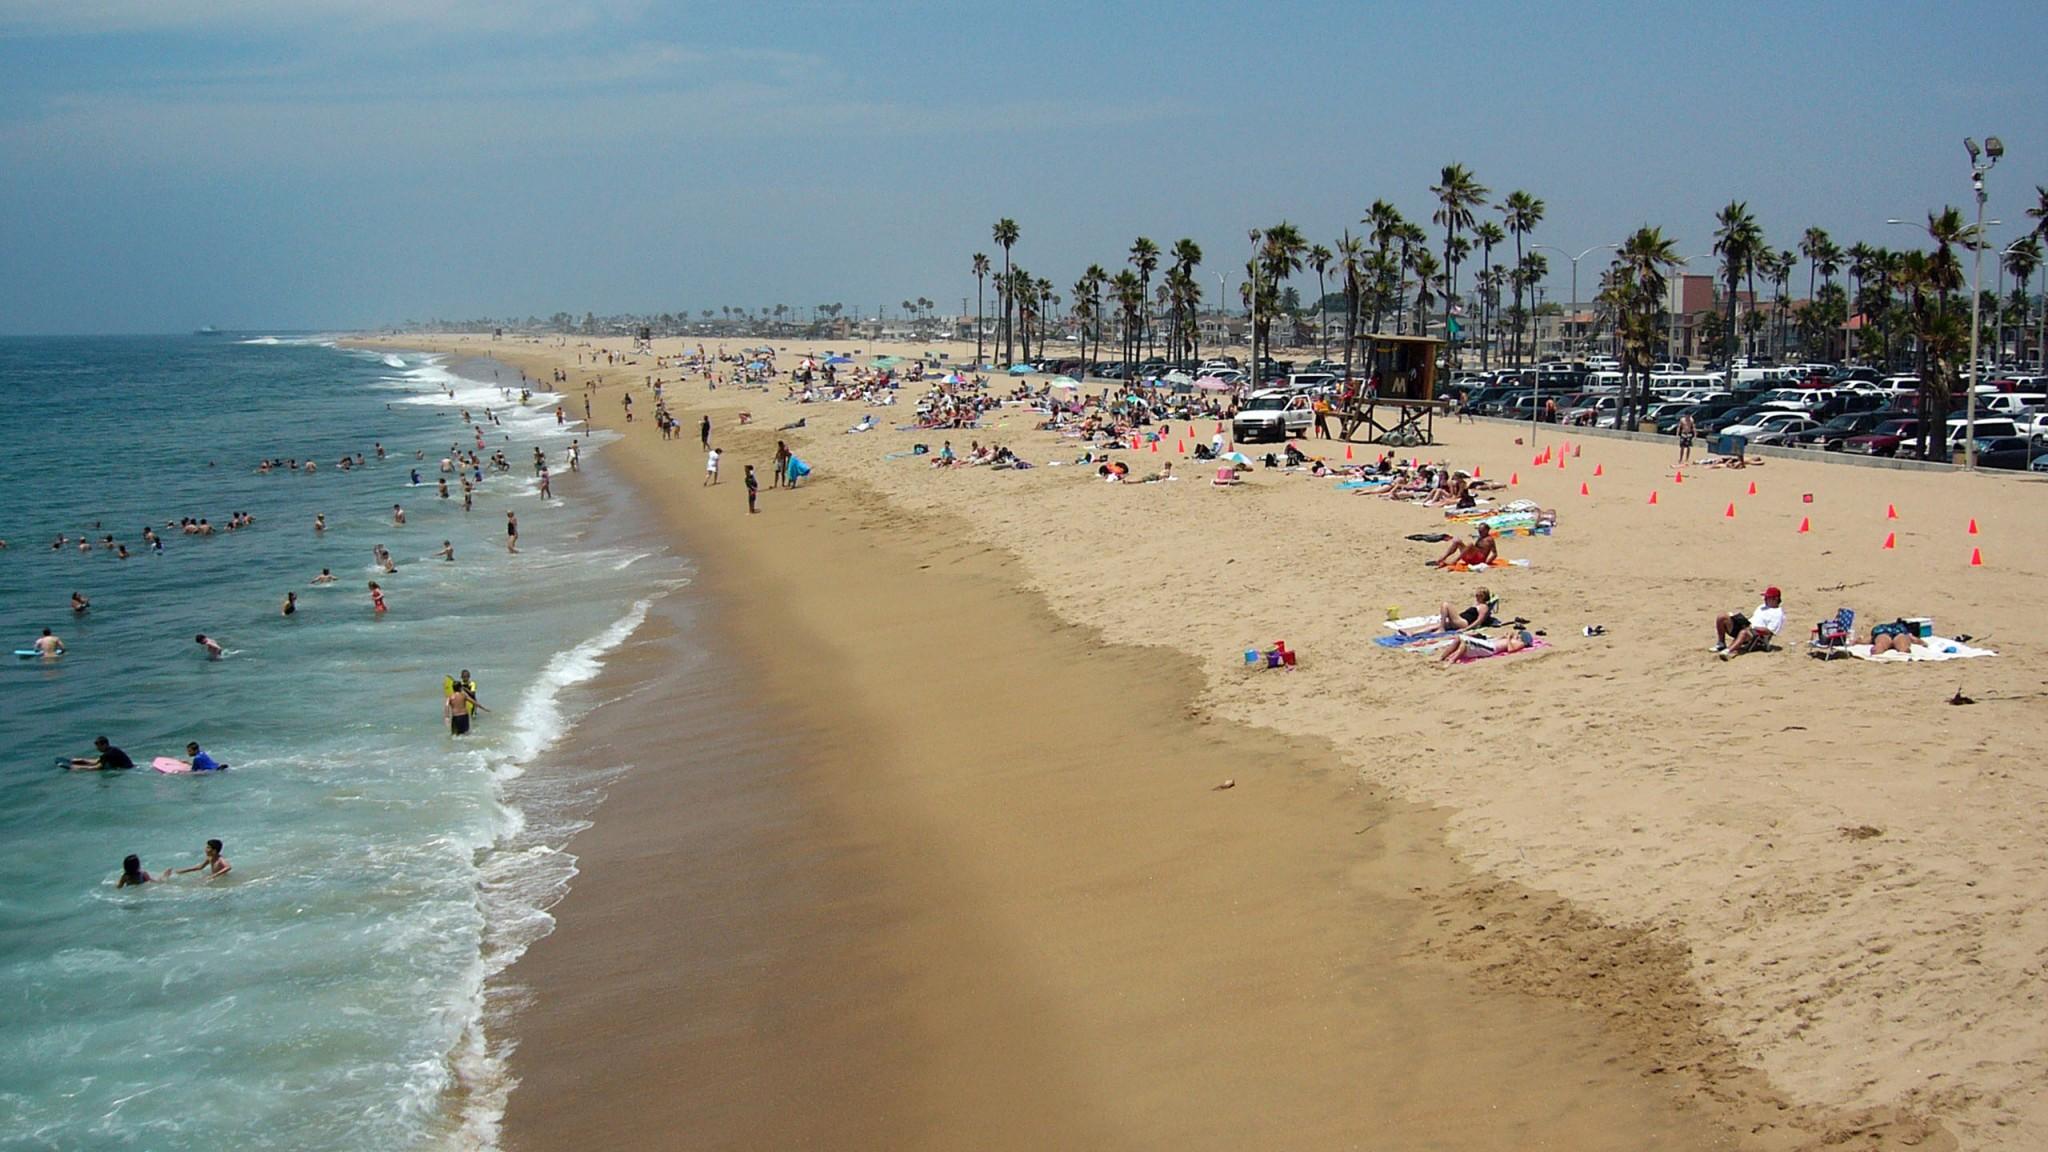 Santa Monica Beach Los Angeles   HQ  for PC HD Wallpaper